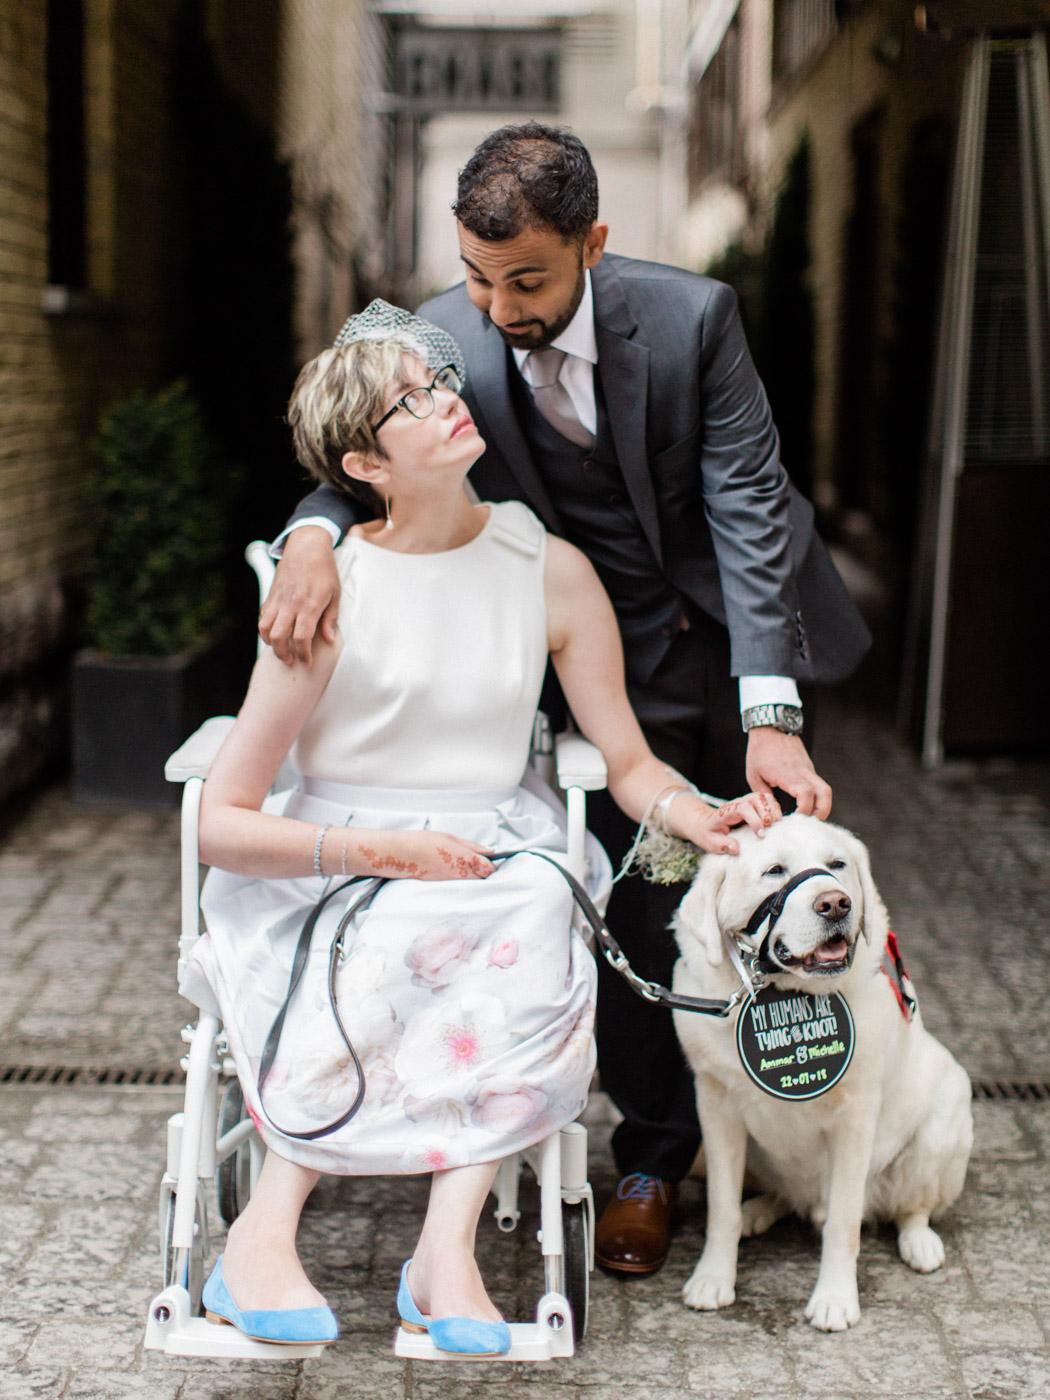 Toronto-wedding-photographer-intimate-restaurant-elopement-chase-oyster-downtown20.jpg